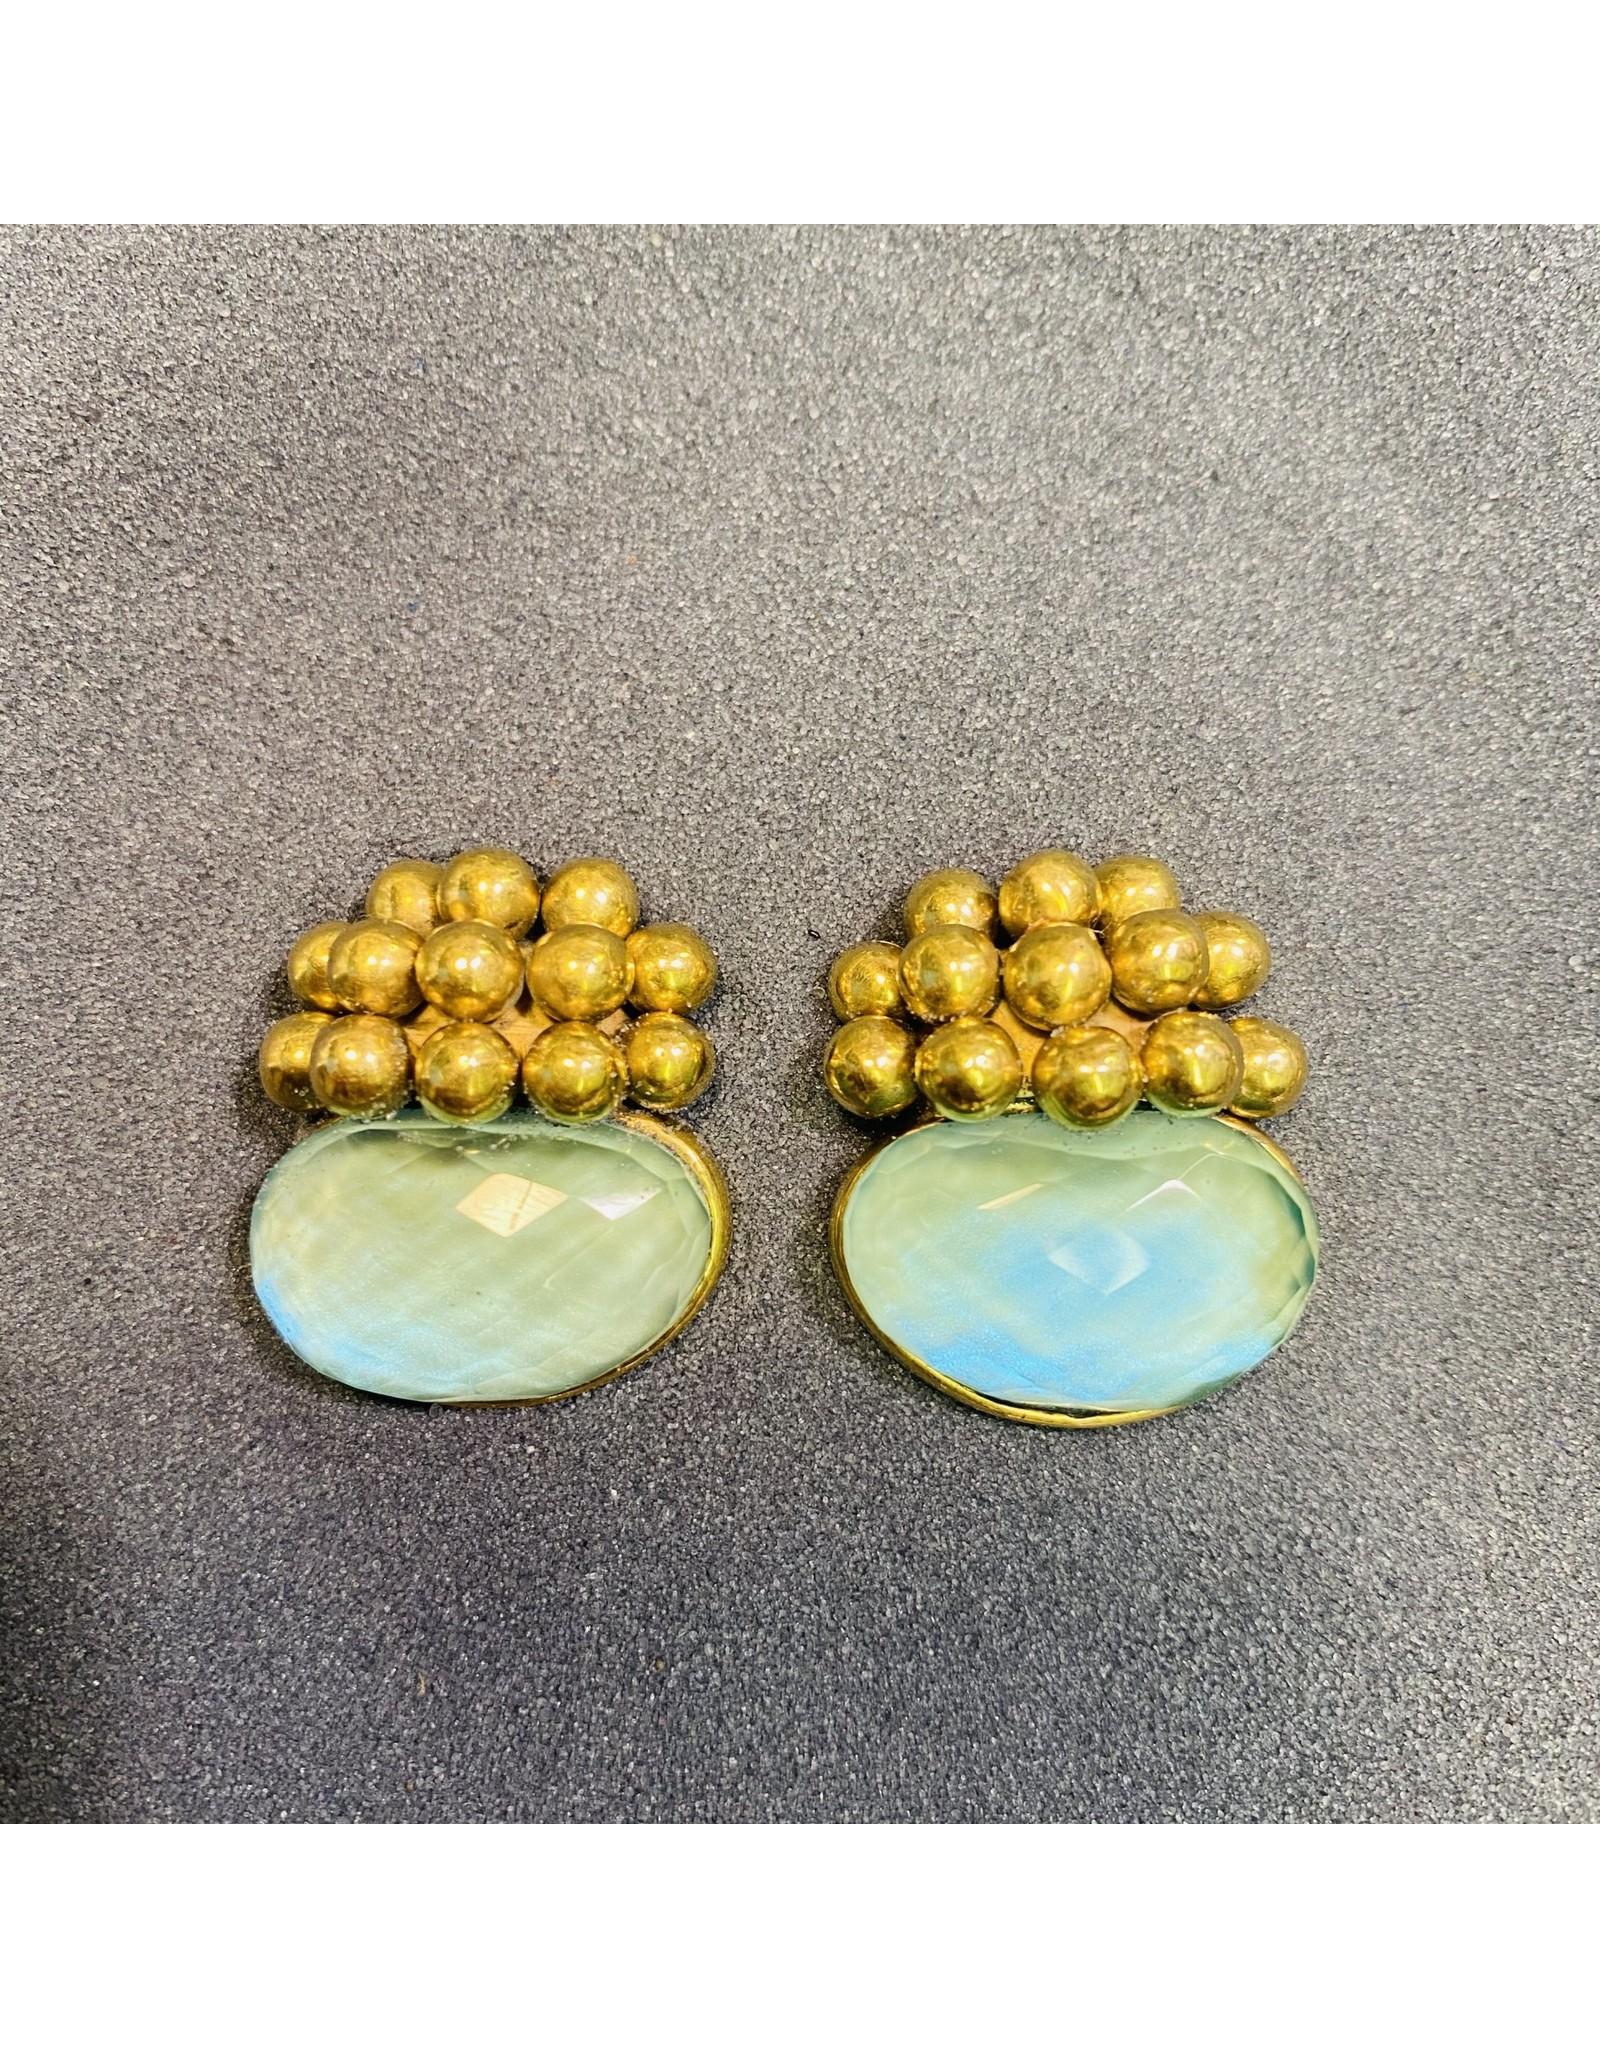 Vaubel Little Gold Balls with Amethyst Clip Earring